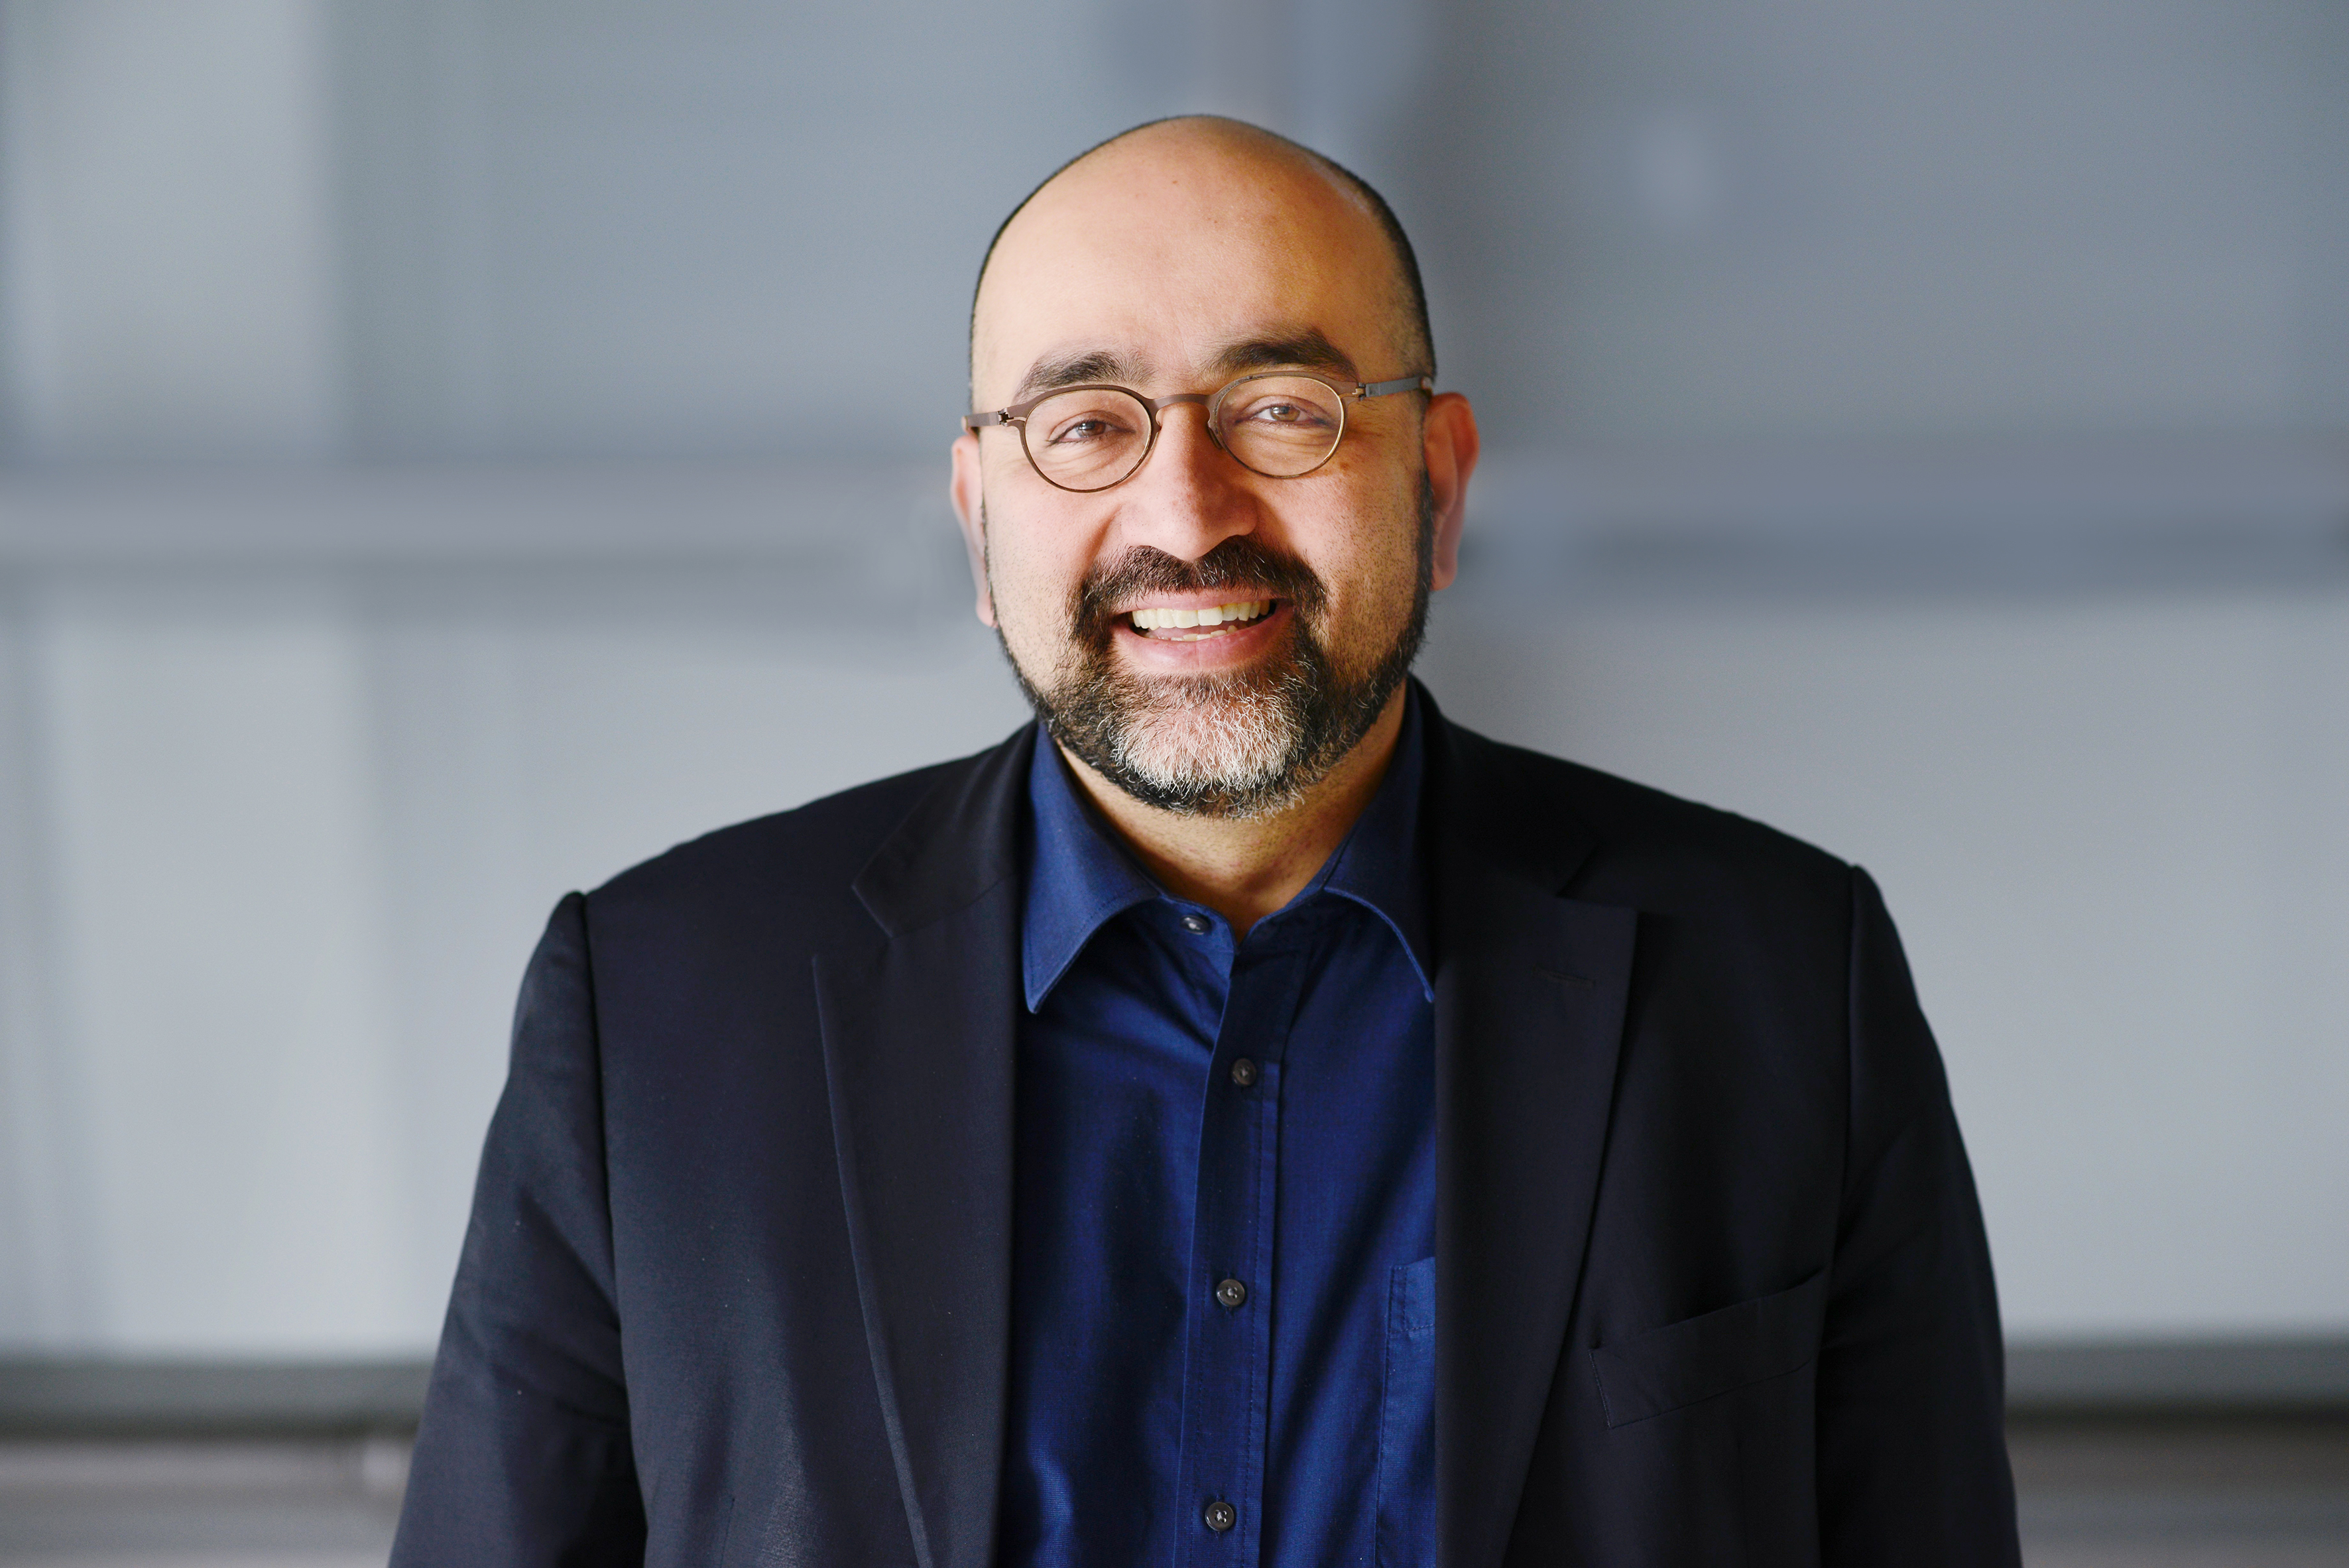 Omid Nouripour MdB, Bündnis 90/Die Grünen Bundestagsfraktion, Stefan Kaminski